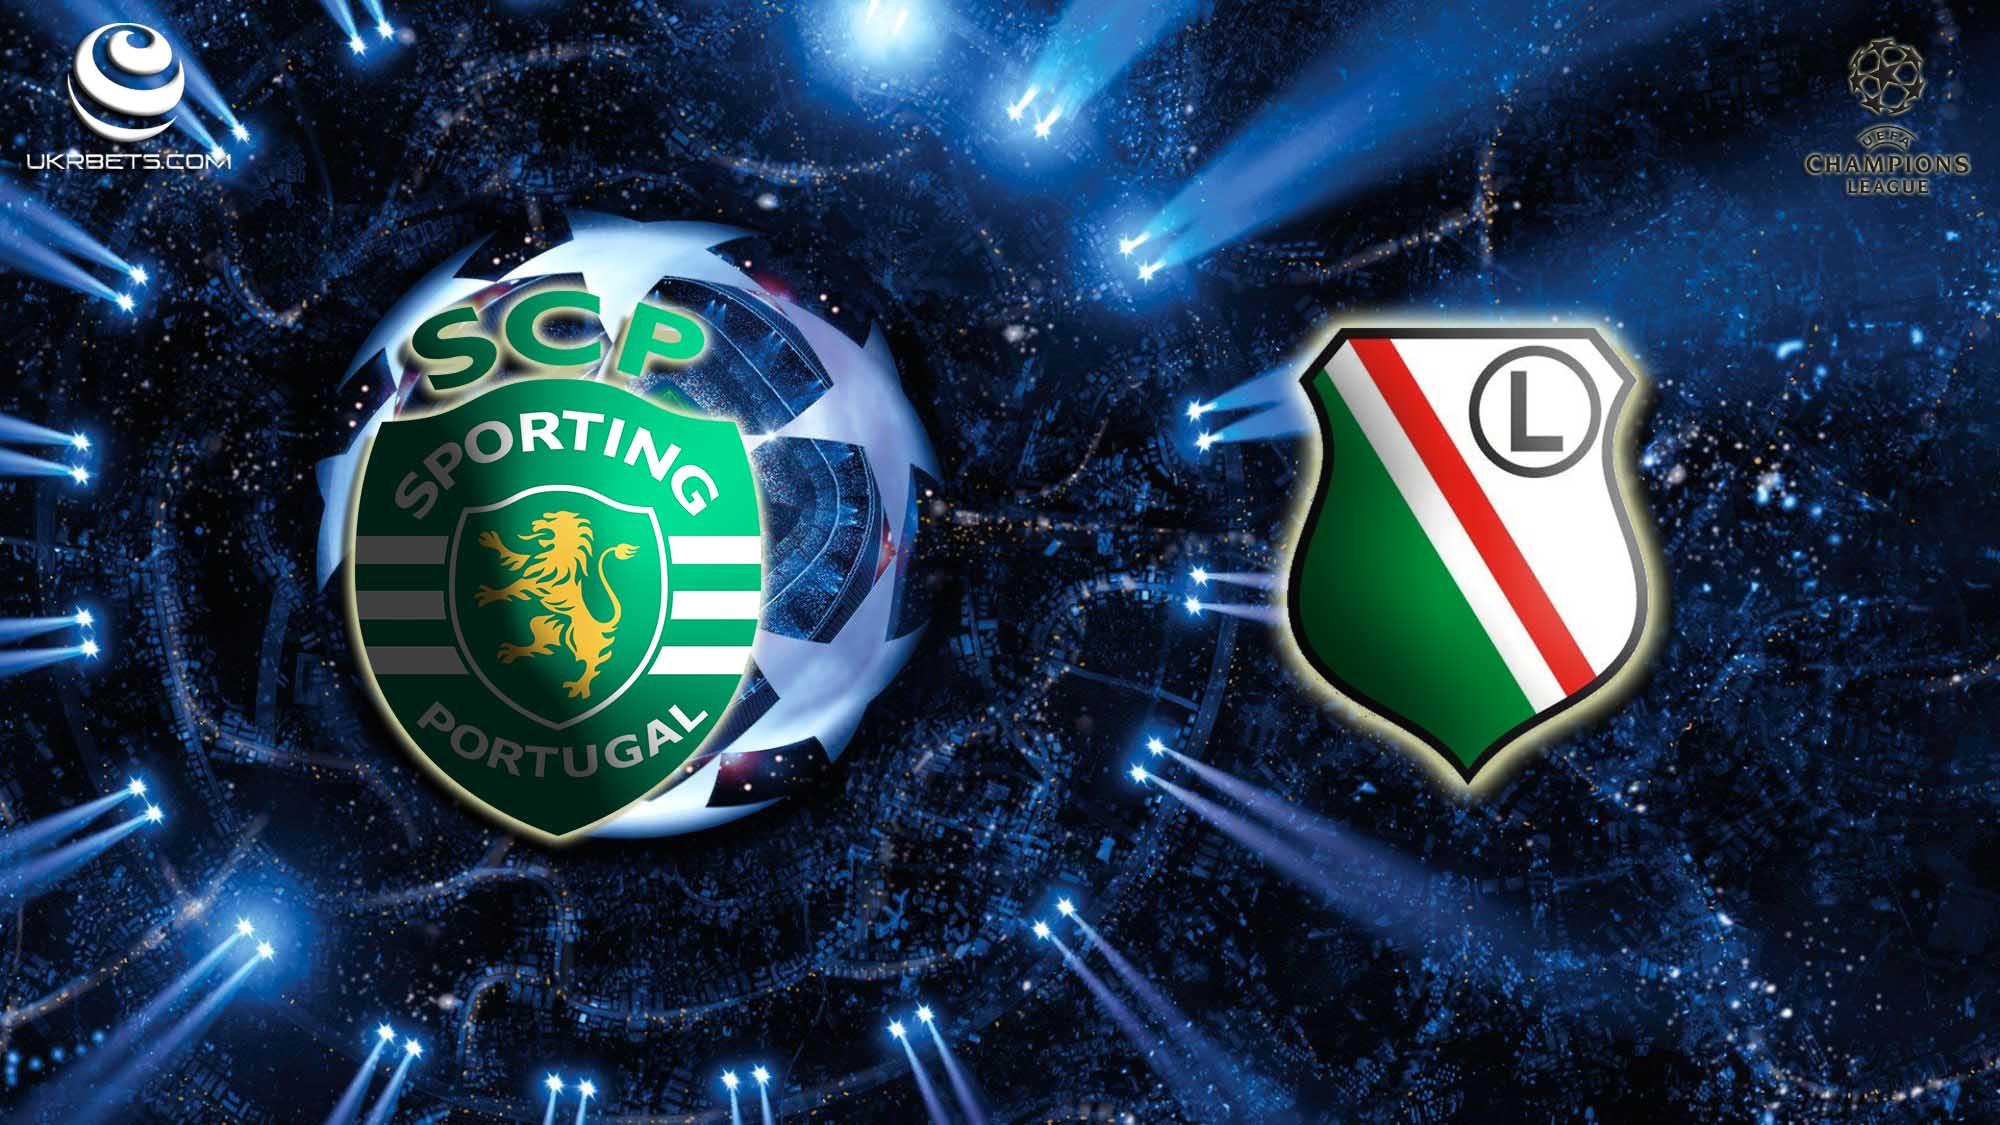 Прогноз на матч Спортинг - Легия 27 сентября 2016